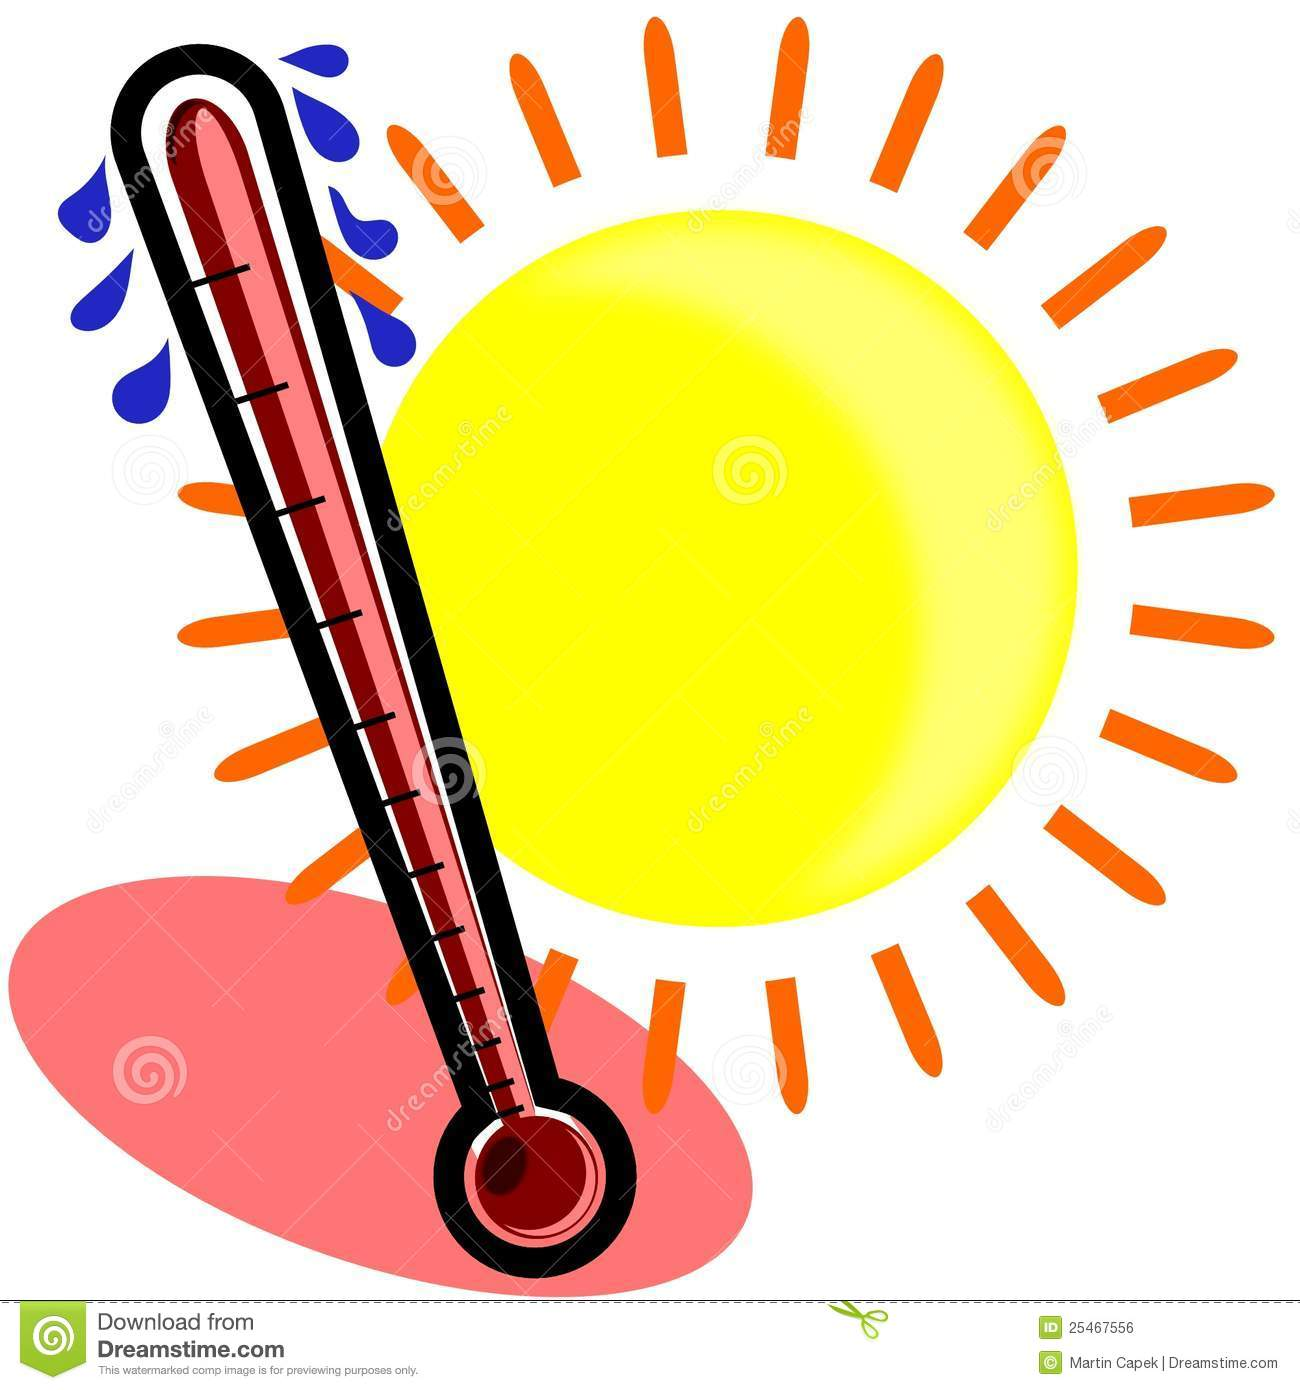 Hot temperature clipart - .